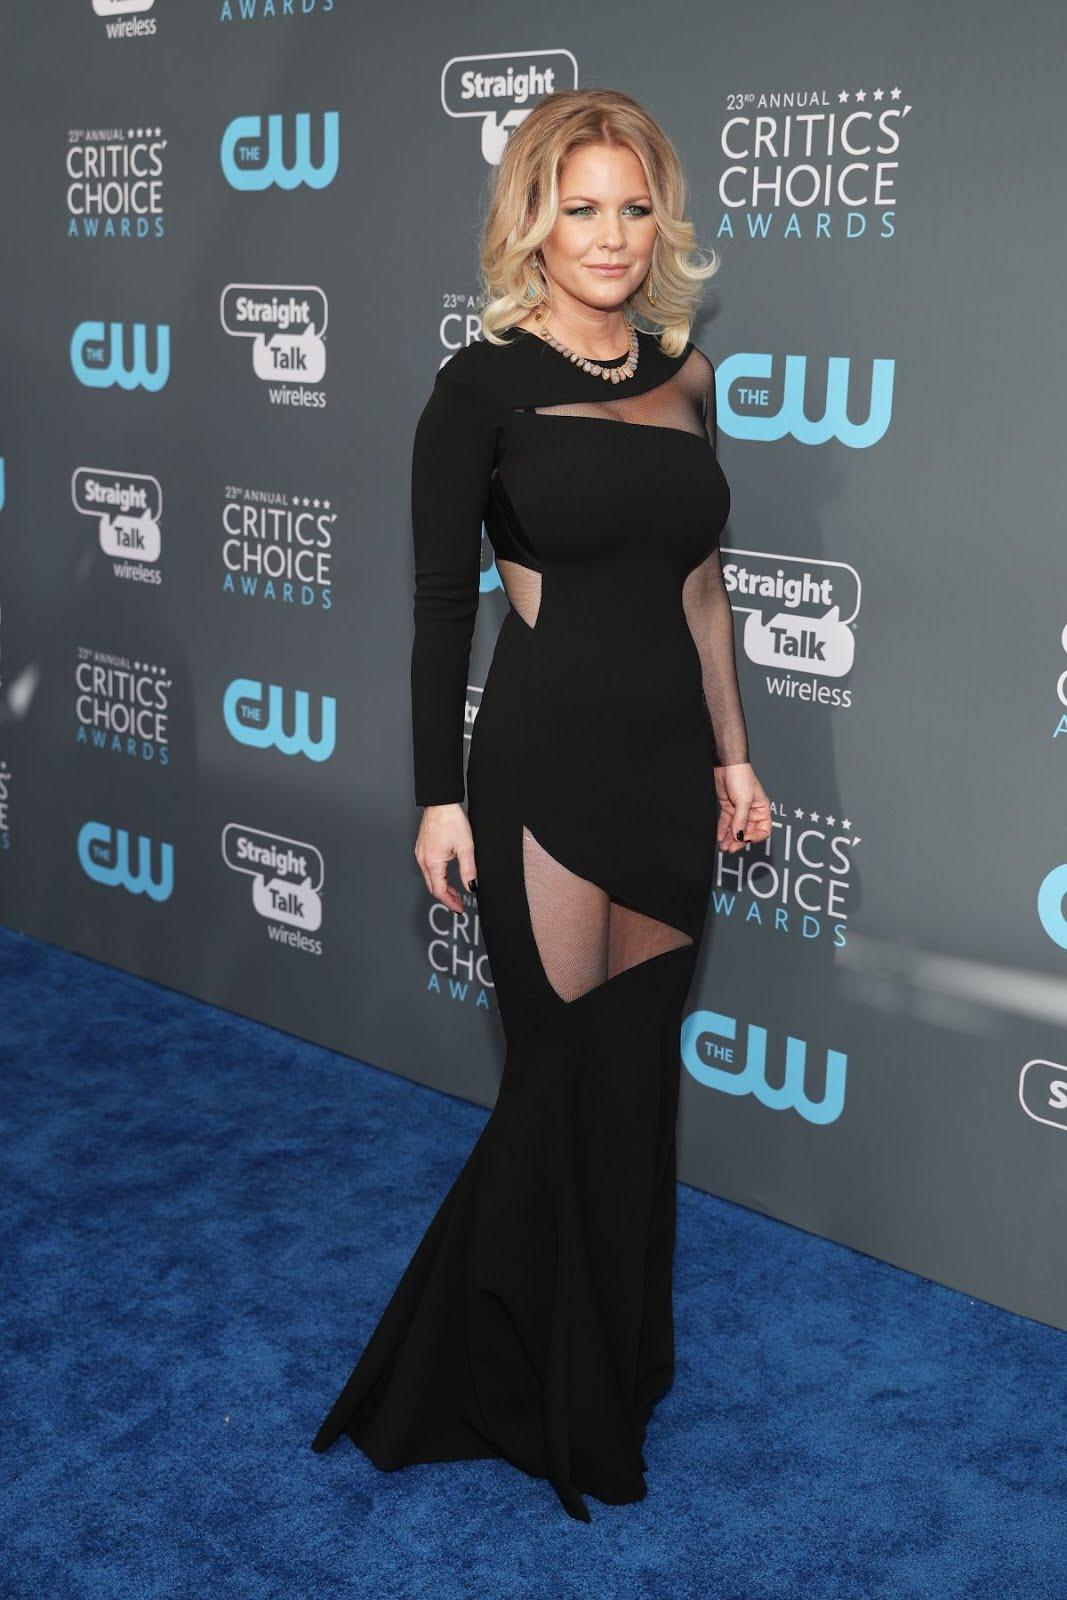 Carrie Keegan At 2018 critics Choice Awards In Santa Monica